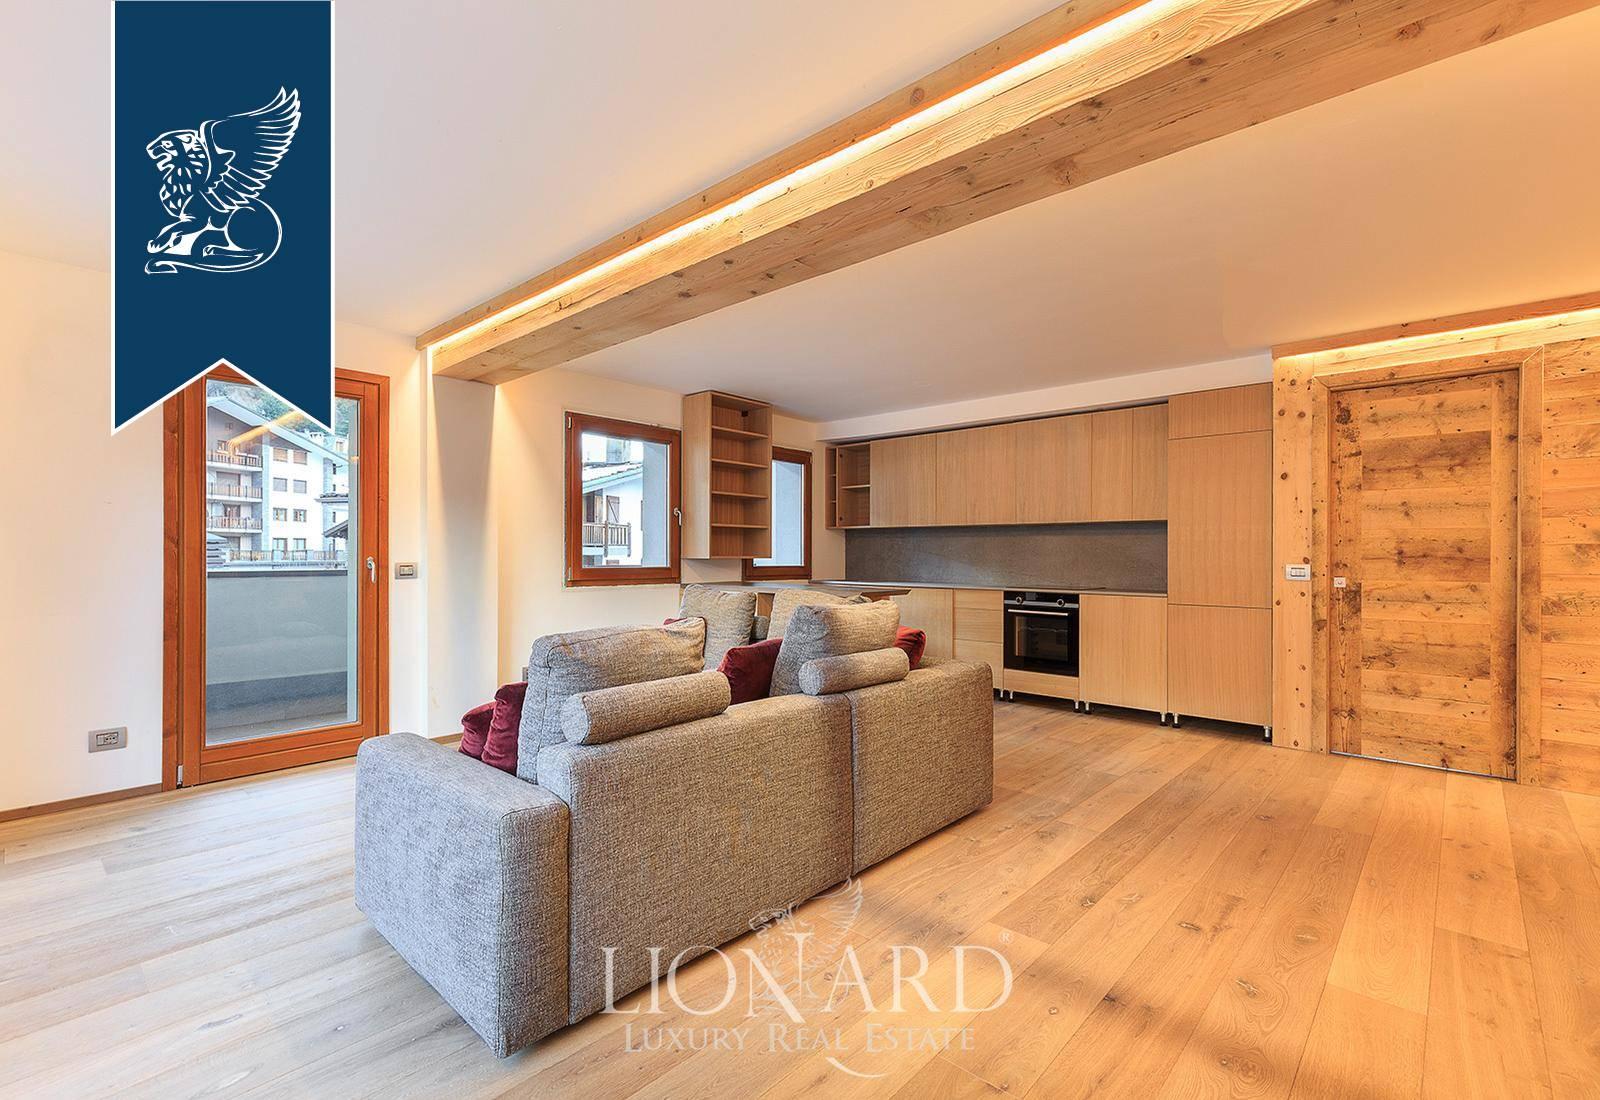 Appartamento in Vendita a Courmayeur: 0 locali, 150 mq - Foto 7